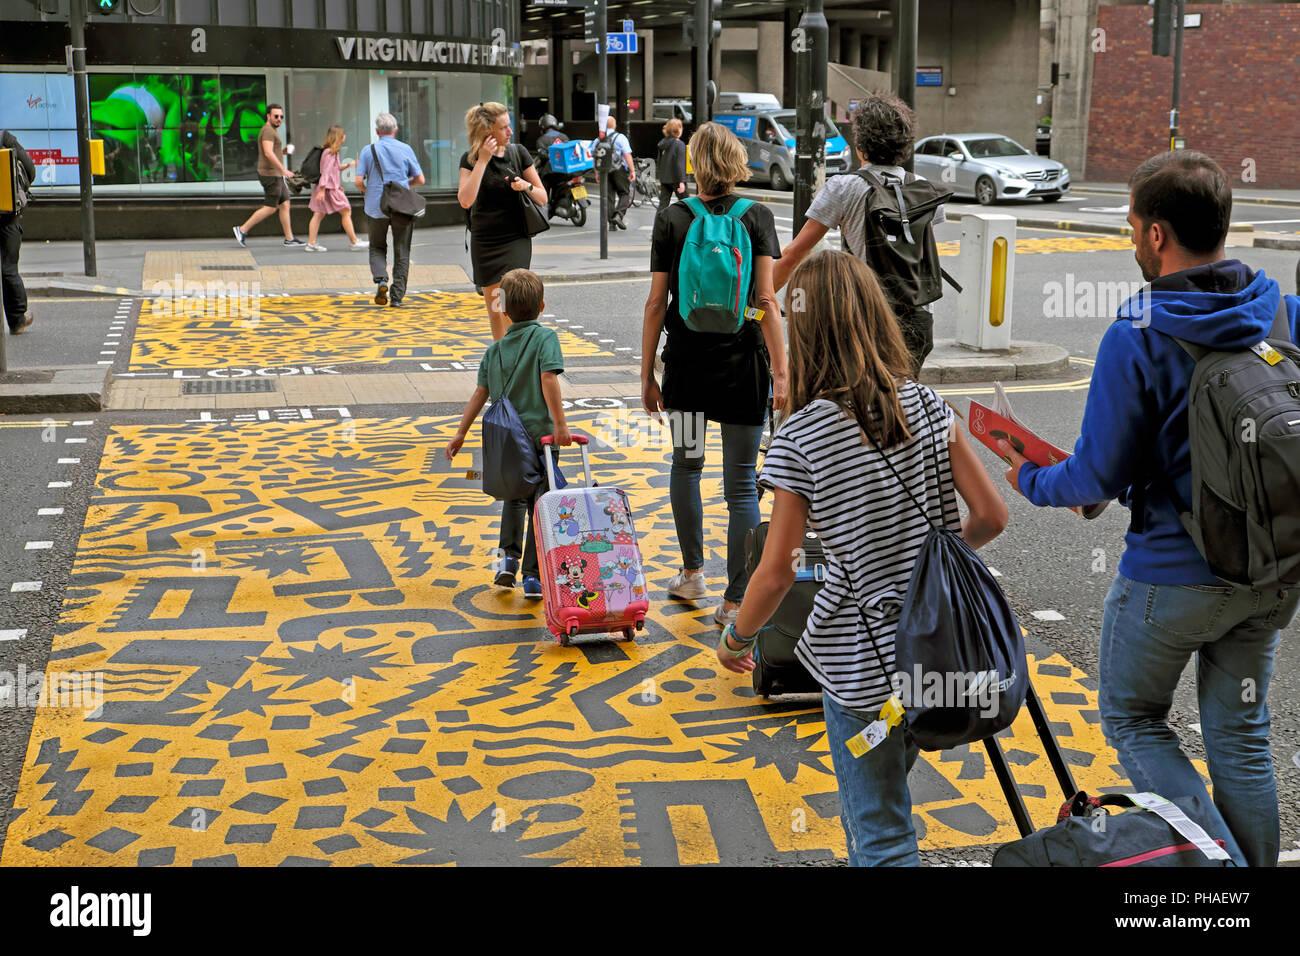 "Familie mit Gepäck auf Eley Kishimoto Kunst' farbenfrohe Kreuzungen"" Buche Street Tunnel & Barbican Station, Kulturmeile, Stadt London UK KATHY DEWITT Stockbild"